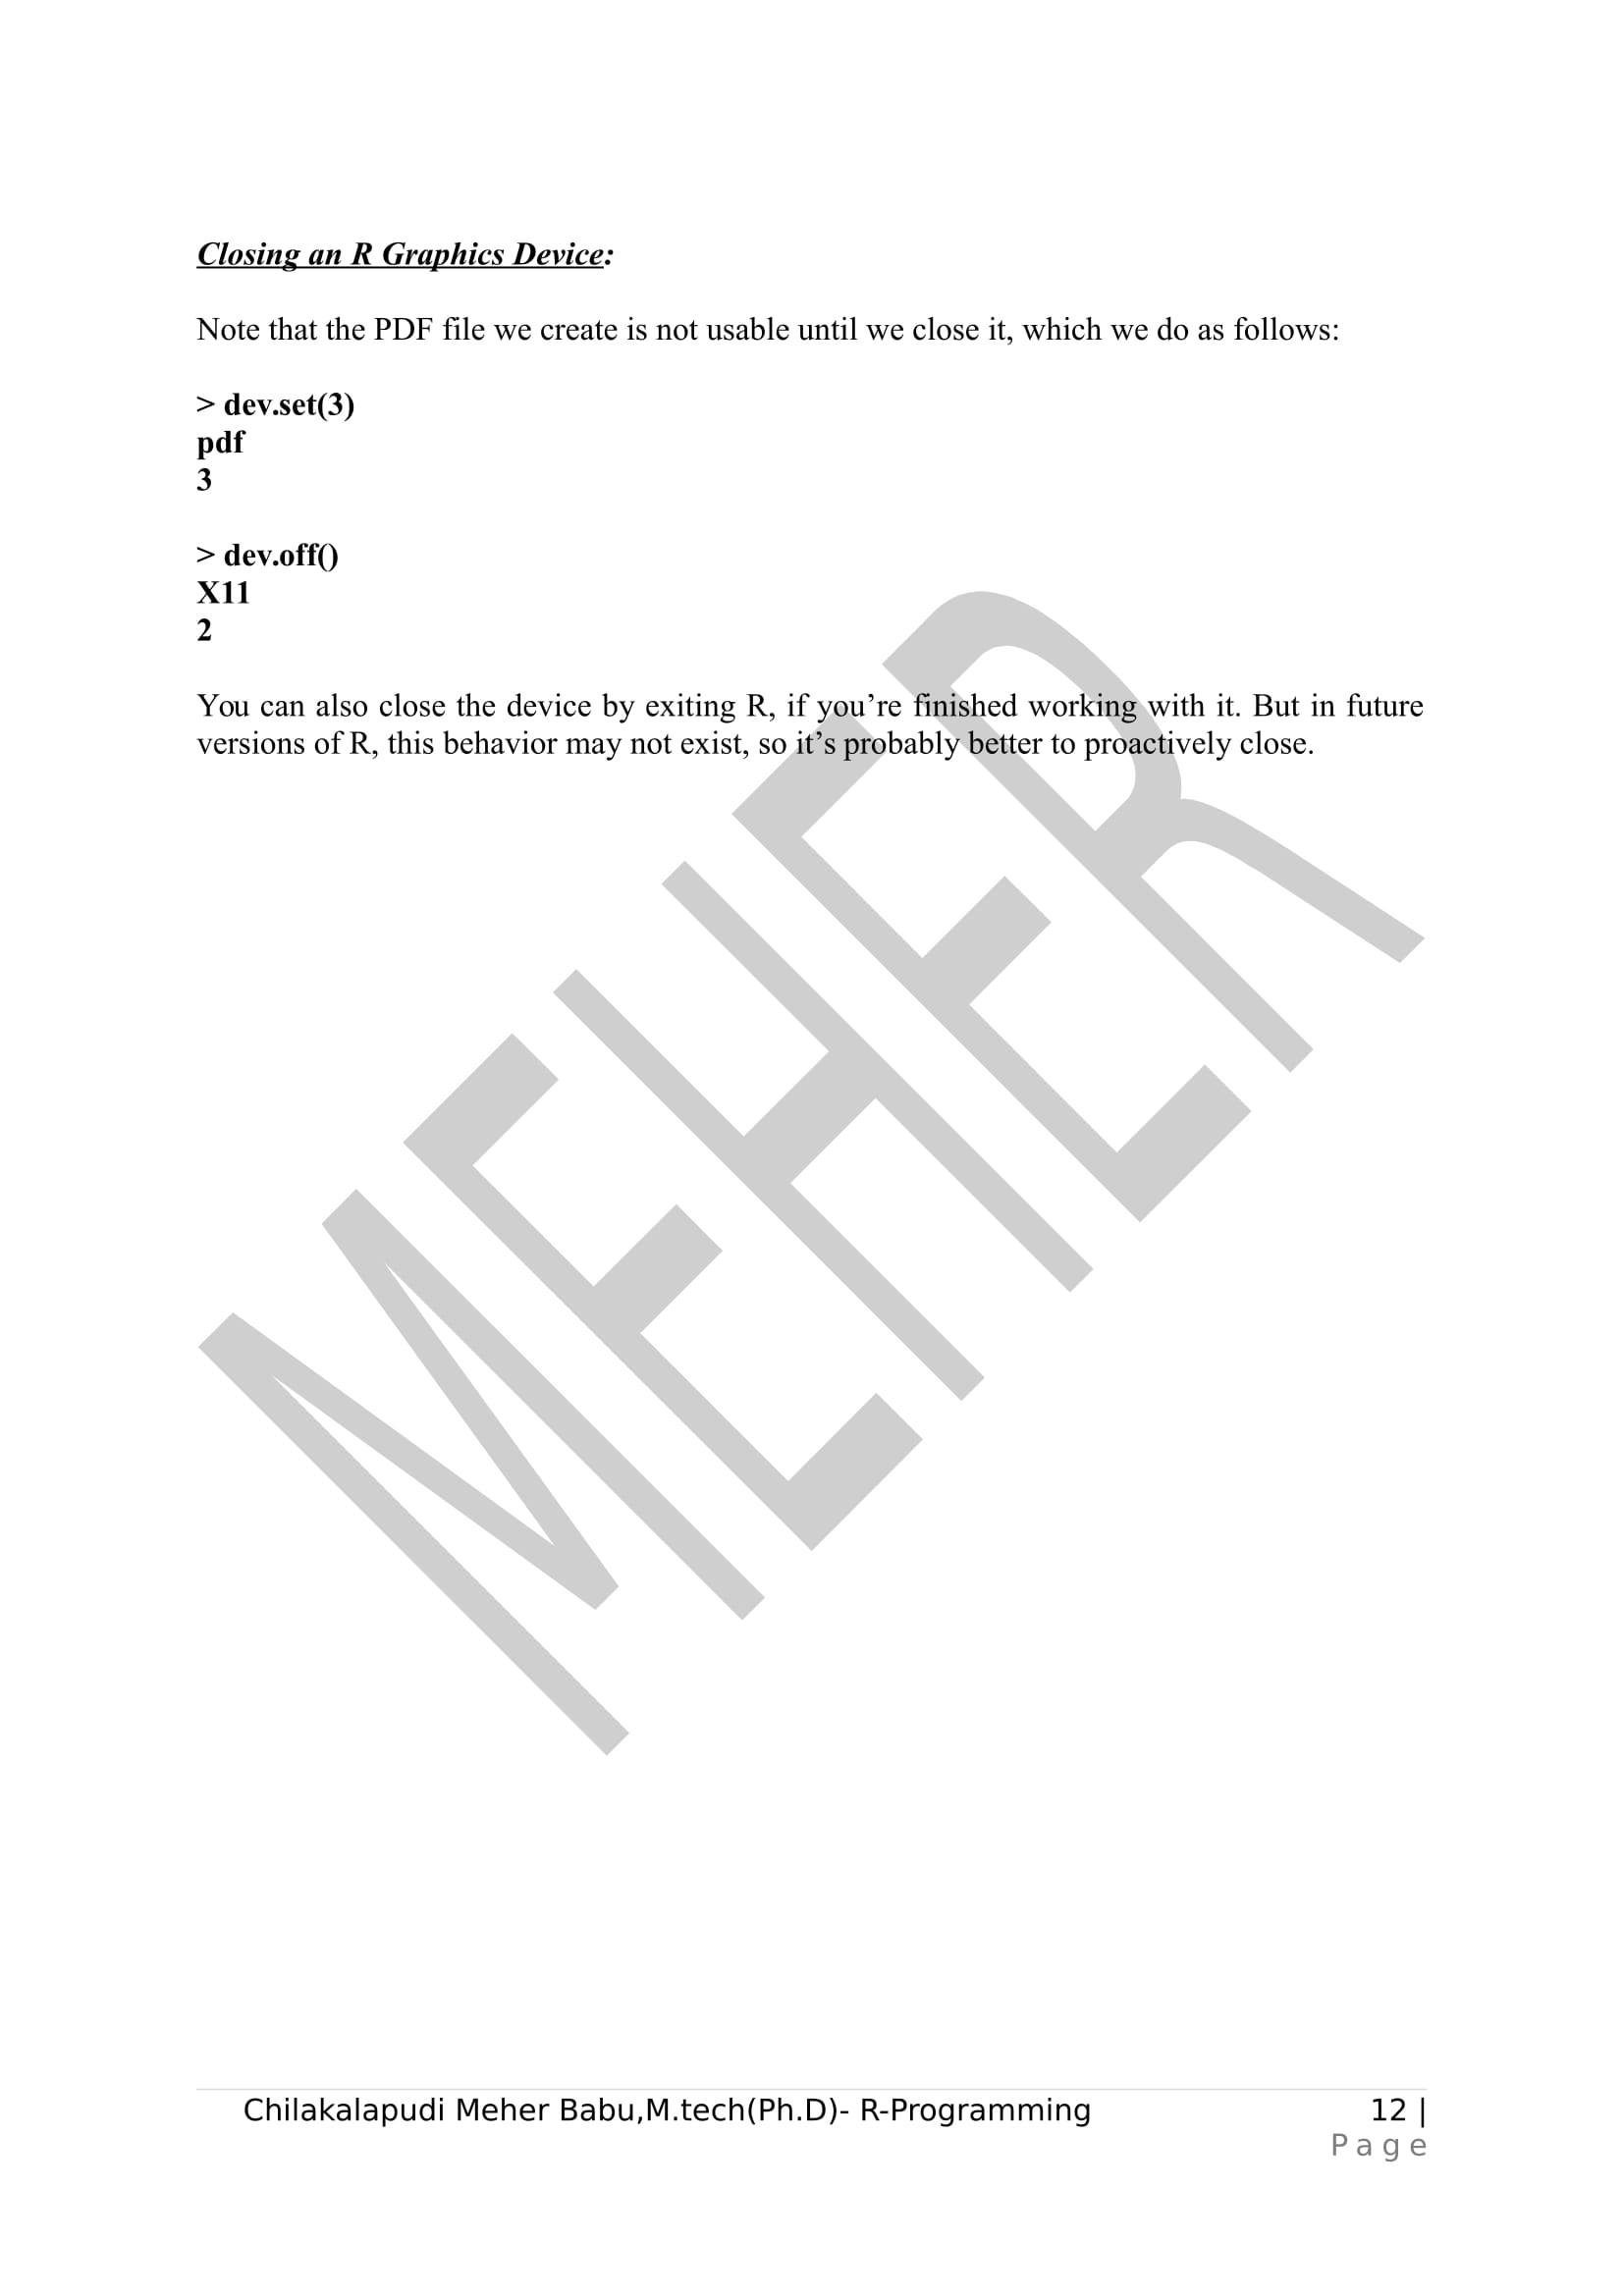 R-prog Unit-IV-12 « Meherchilakalapudi, writes for u  !